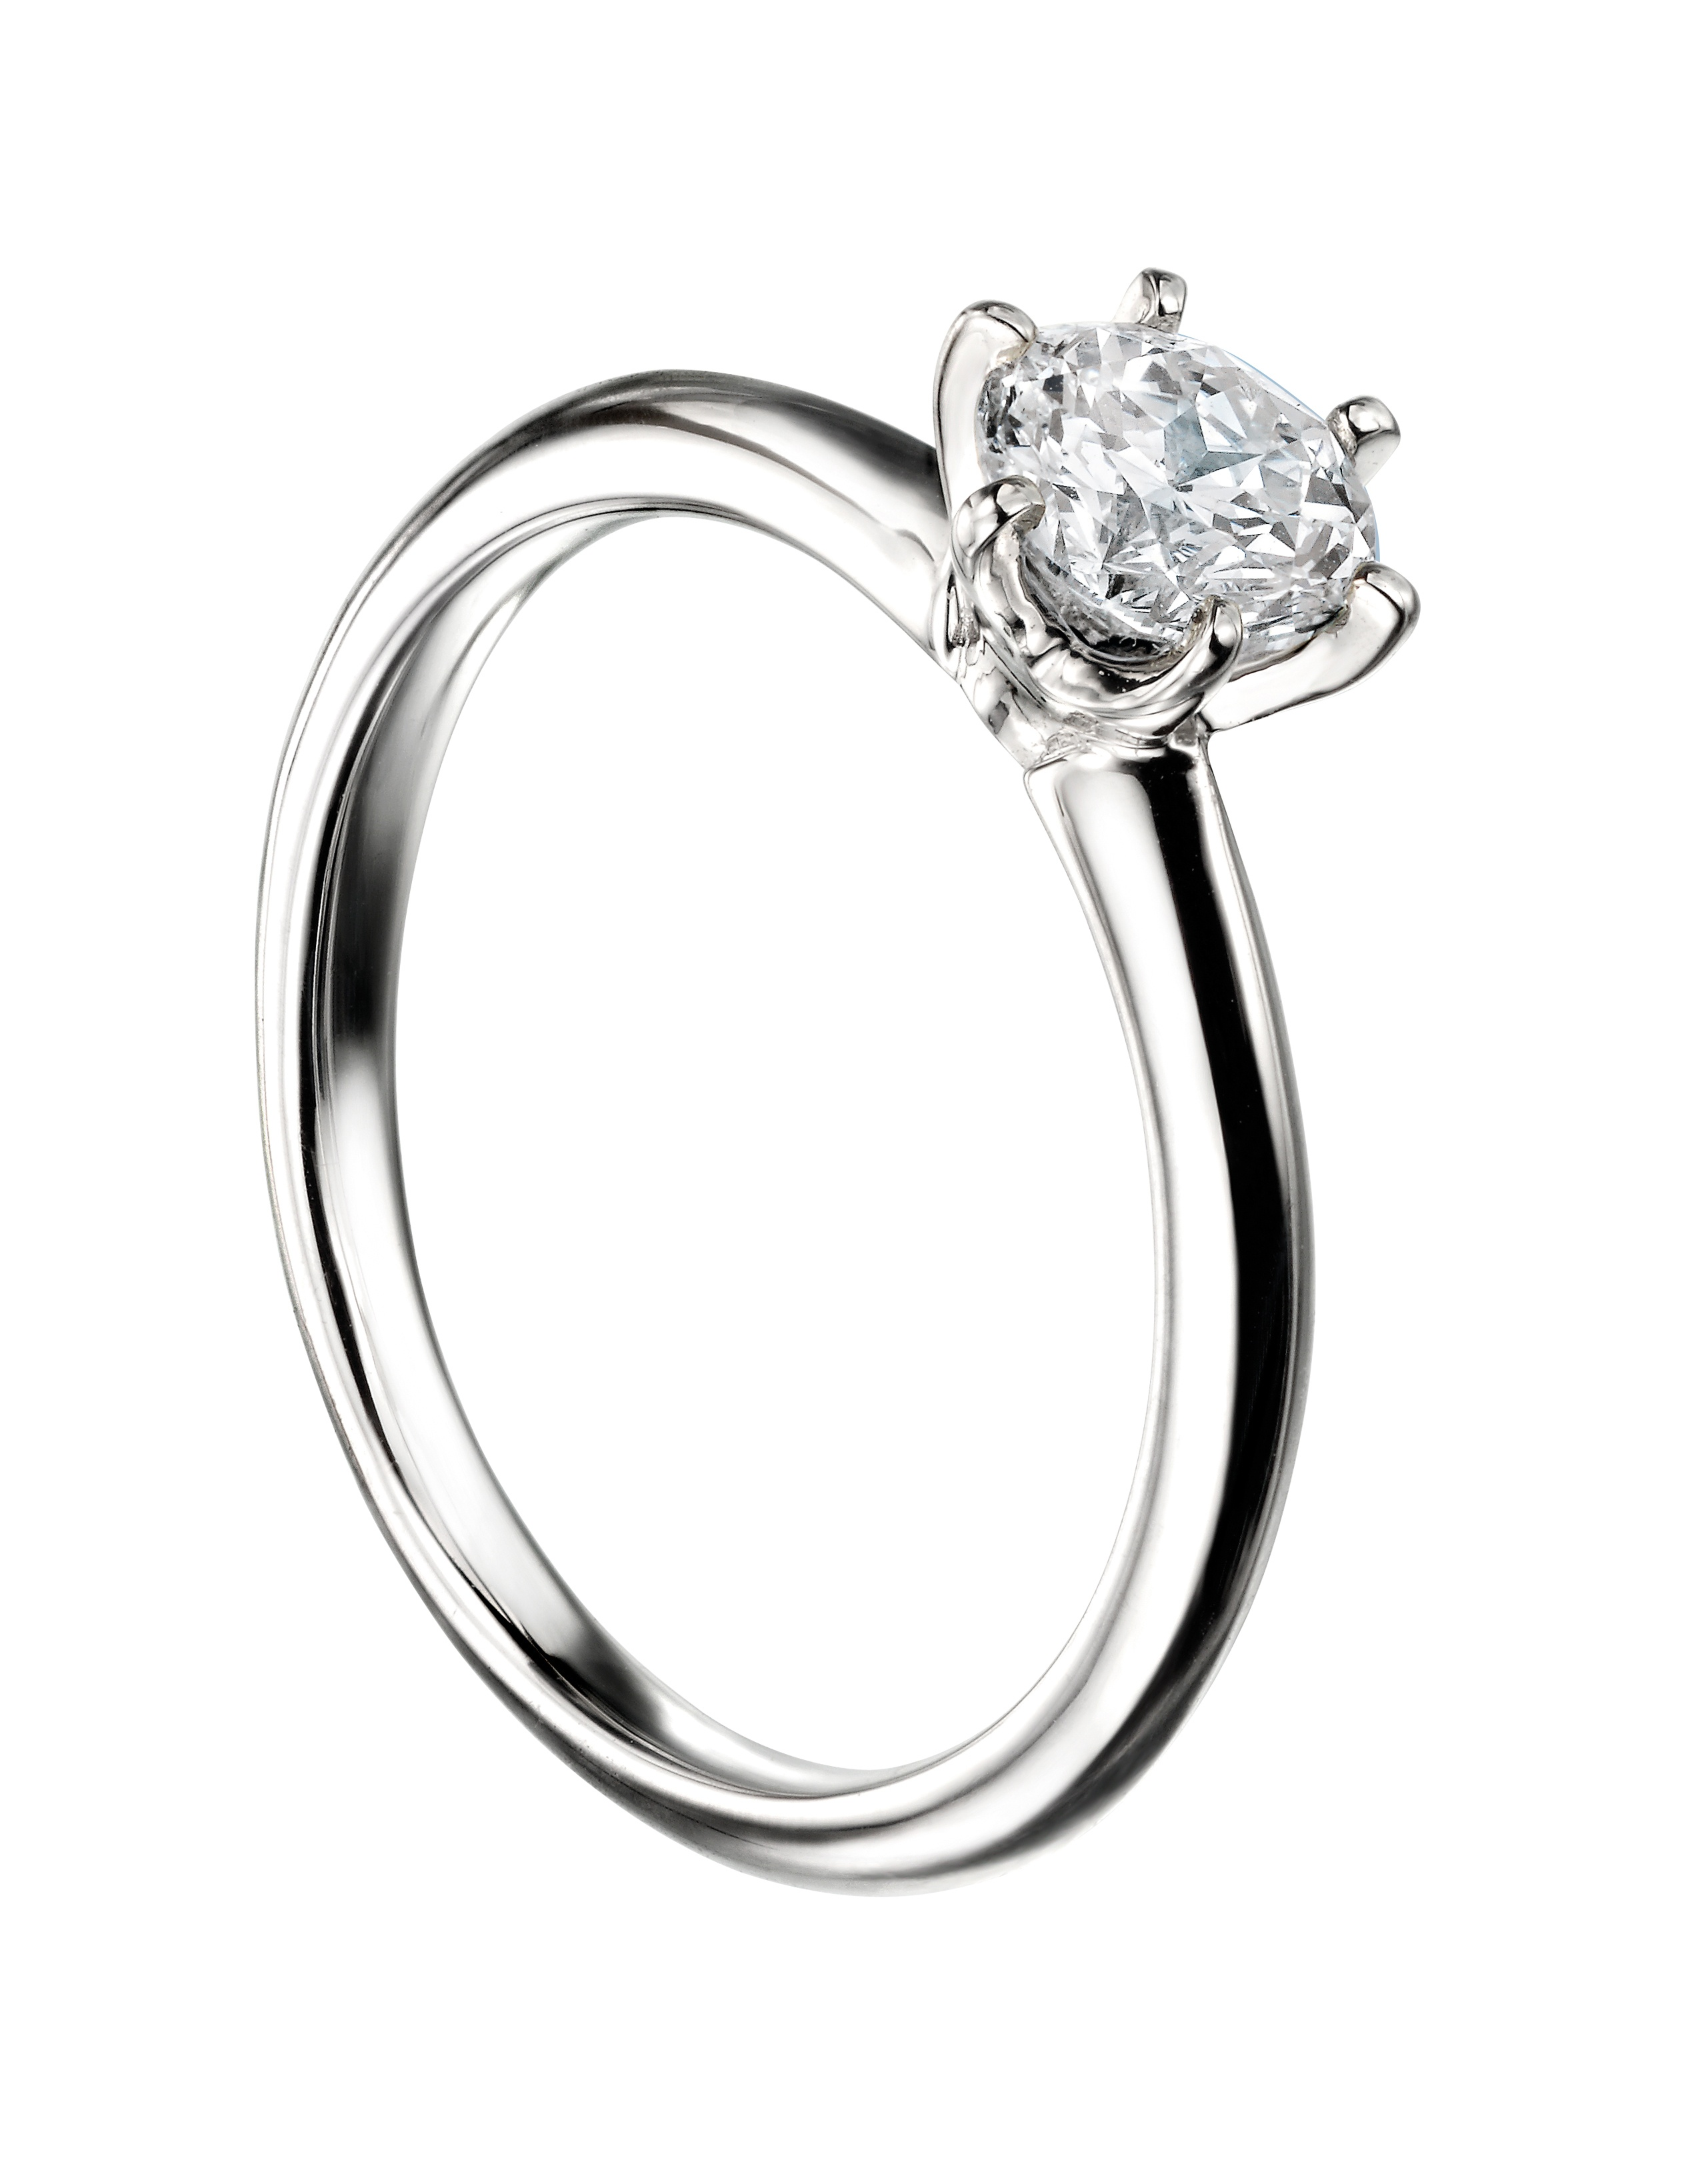 0.25ct Mastercut Diamond 6 Claw Simplicity Ring